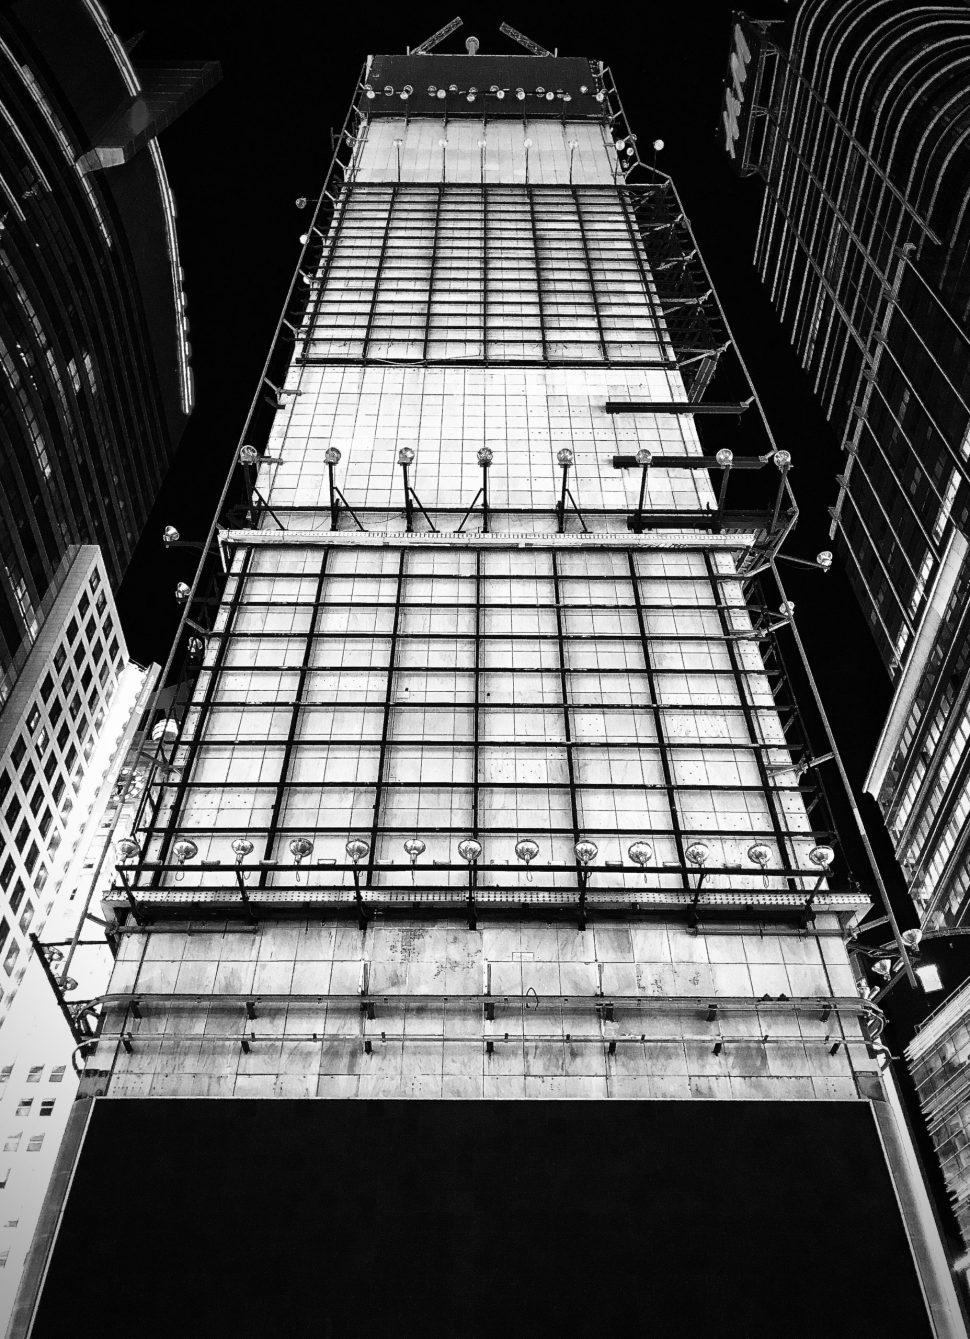 Blade Runner (Part 8). Photo by Rick Stachura. June 6, 2021.